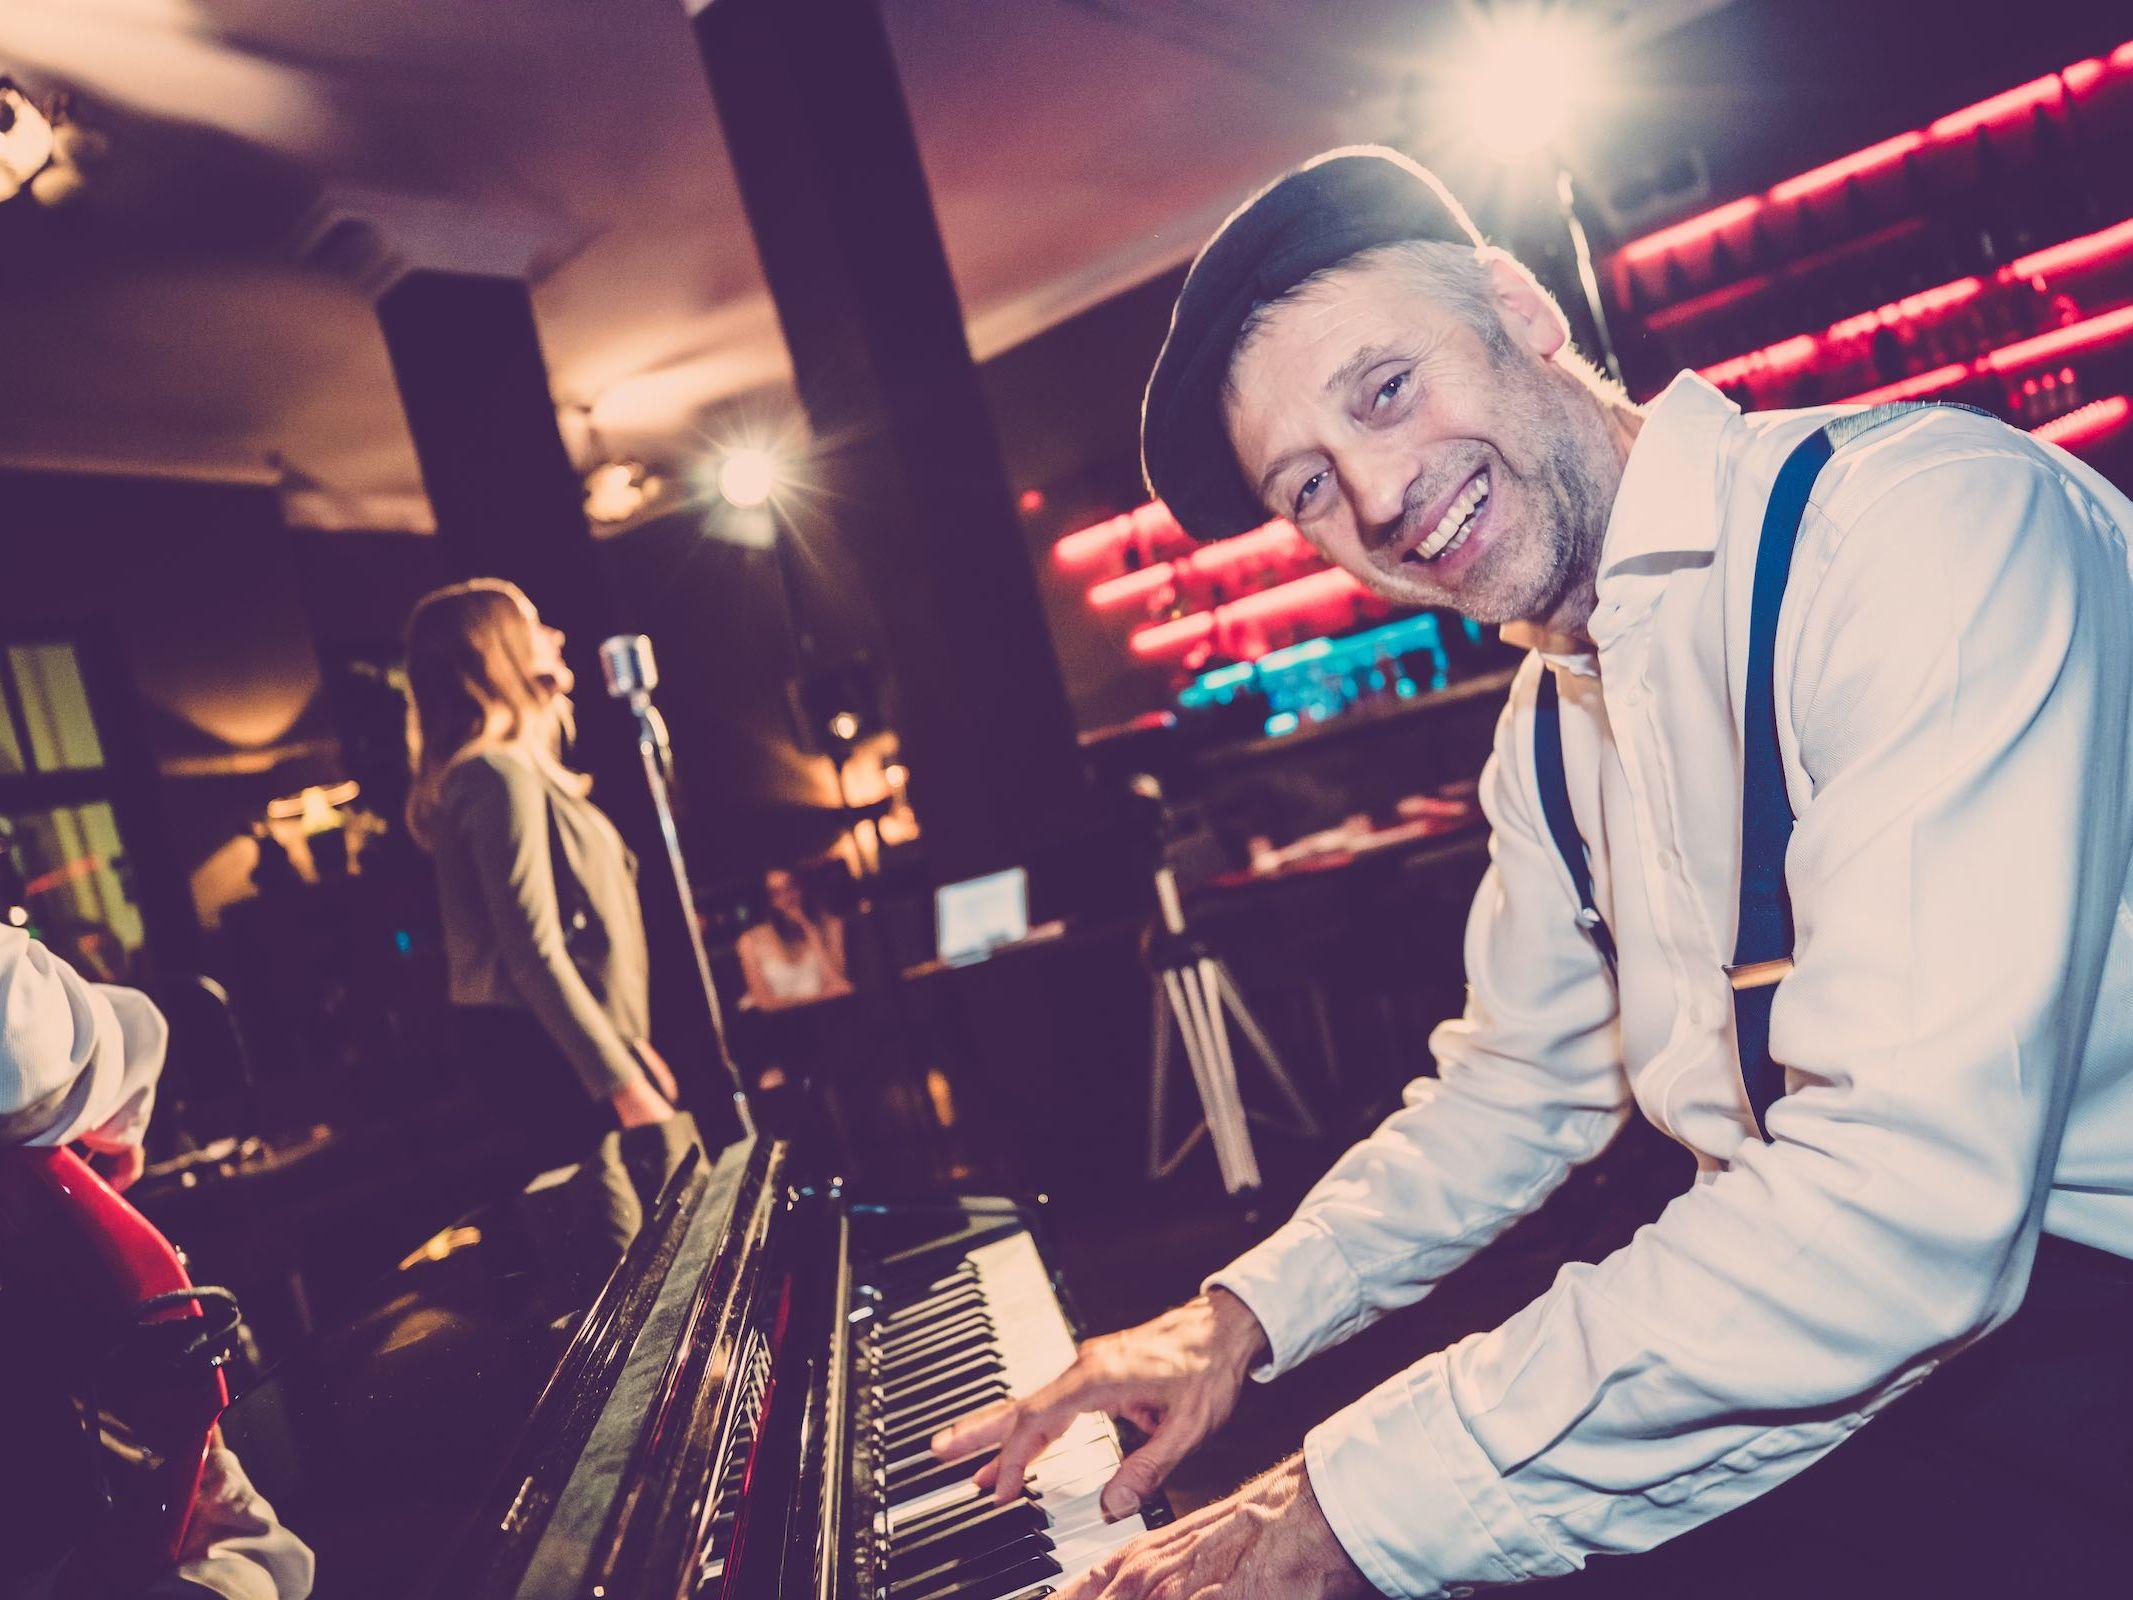 Pianist | Klavierspieler | Hannover | Flügel | Piano | Hochzeit | Buchen | Livemusik | Jazz | Swing | Pop | Party | Motown | Soul | Klavier | Messe | Firmenfeier | Empfang | Buchen | Mieten | Anfragen | Lehmann | Eventservice